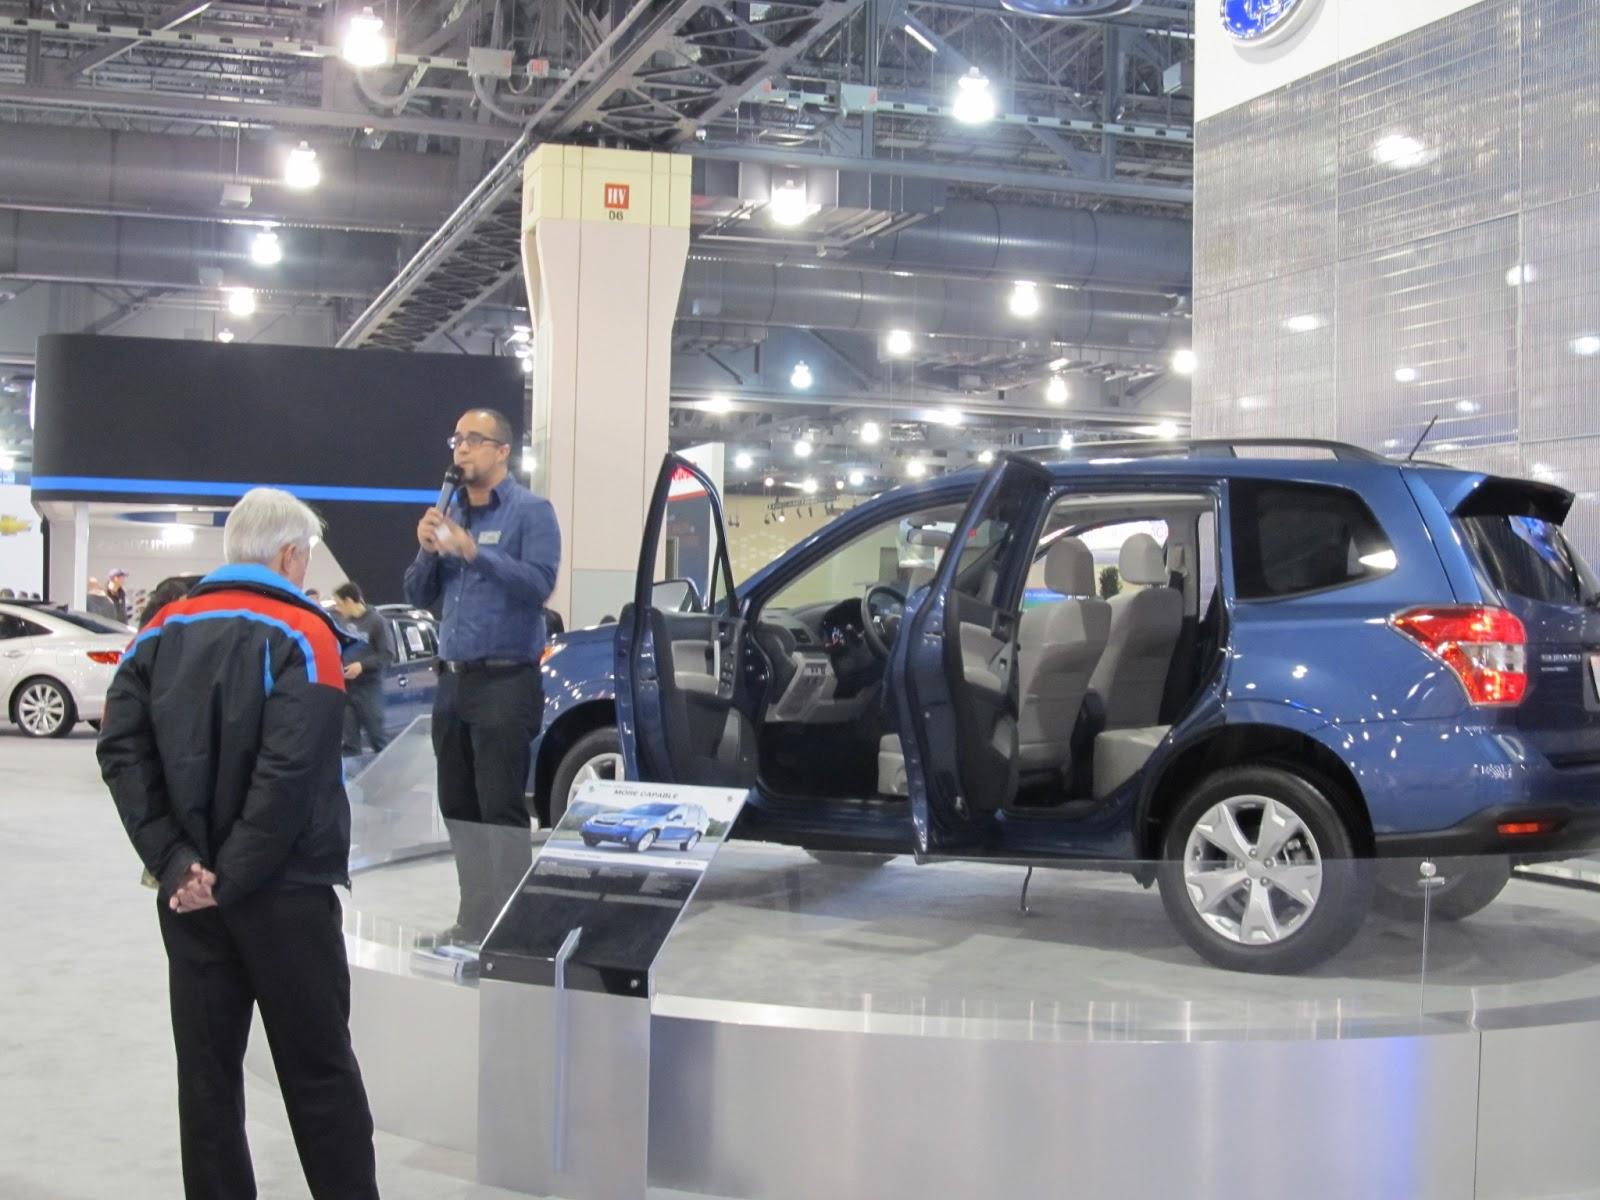 AT ChevroletSubaru At Your Service January - Philadelphia international car show